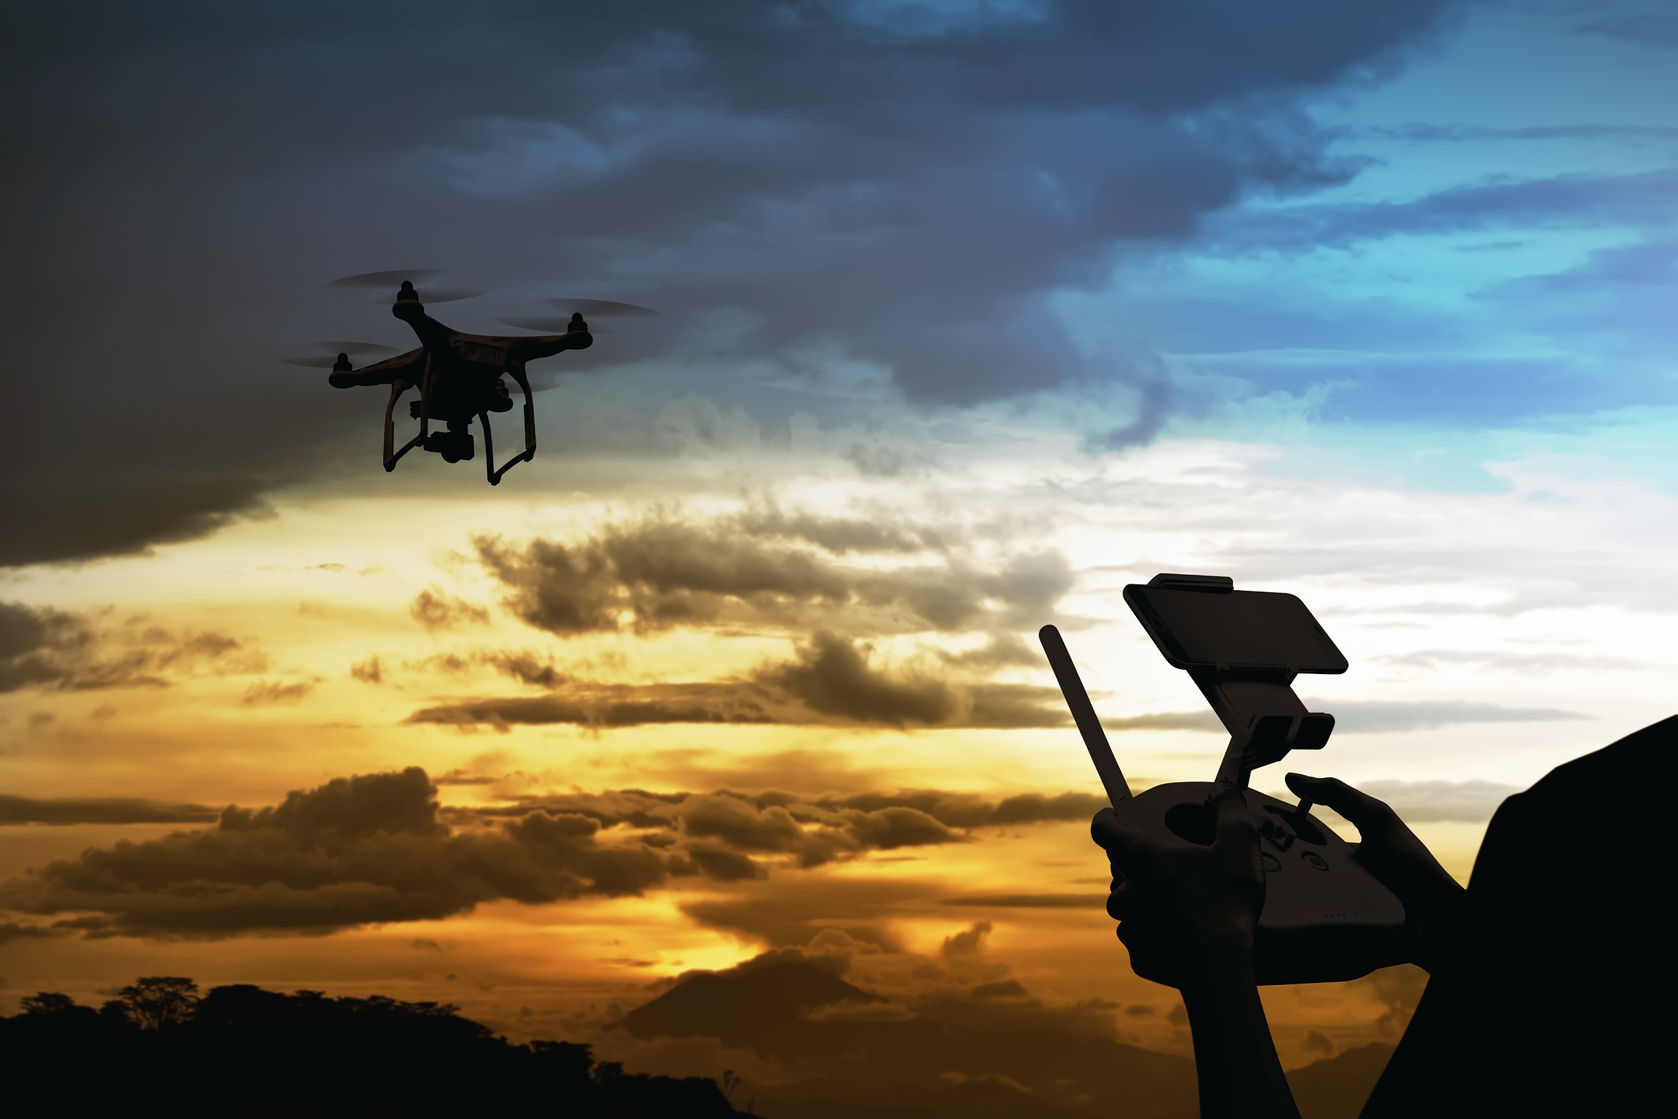 drone-pilot.jpg